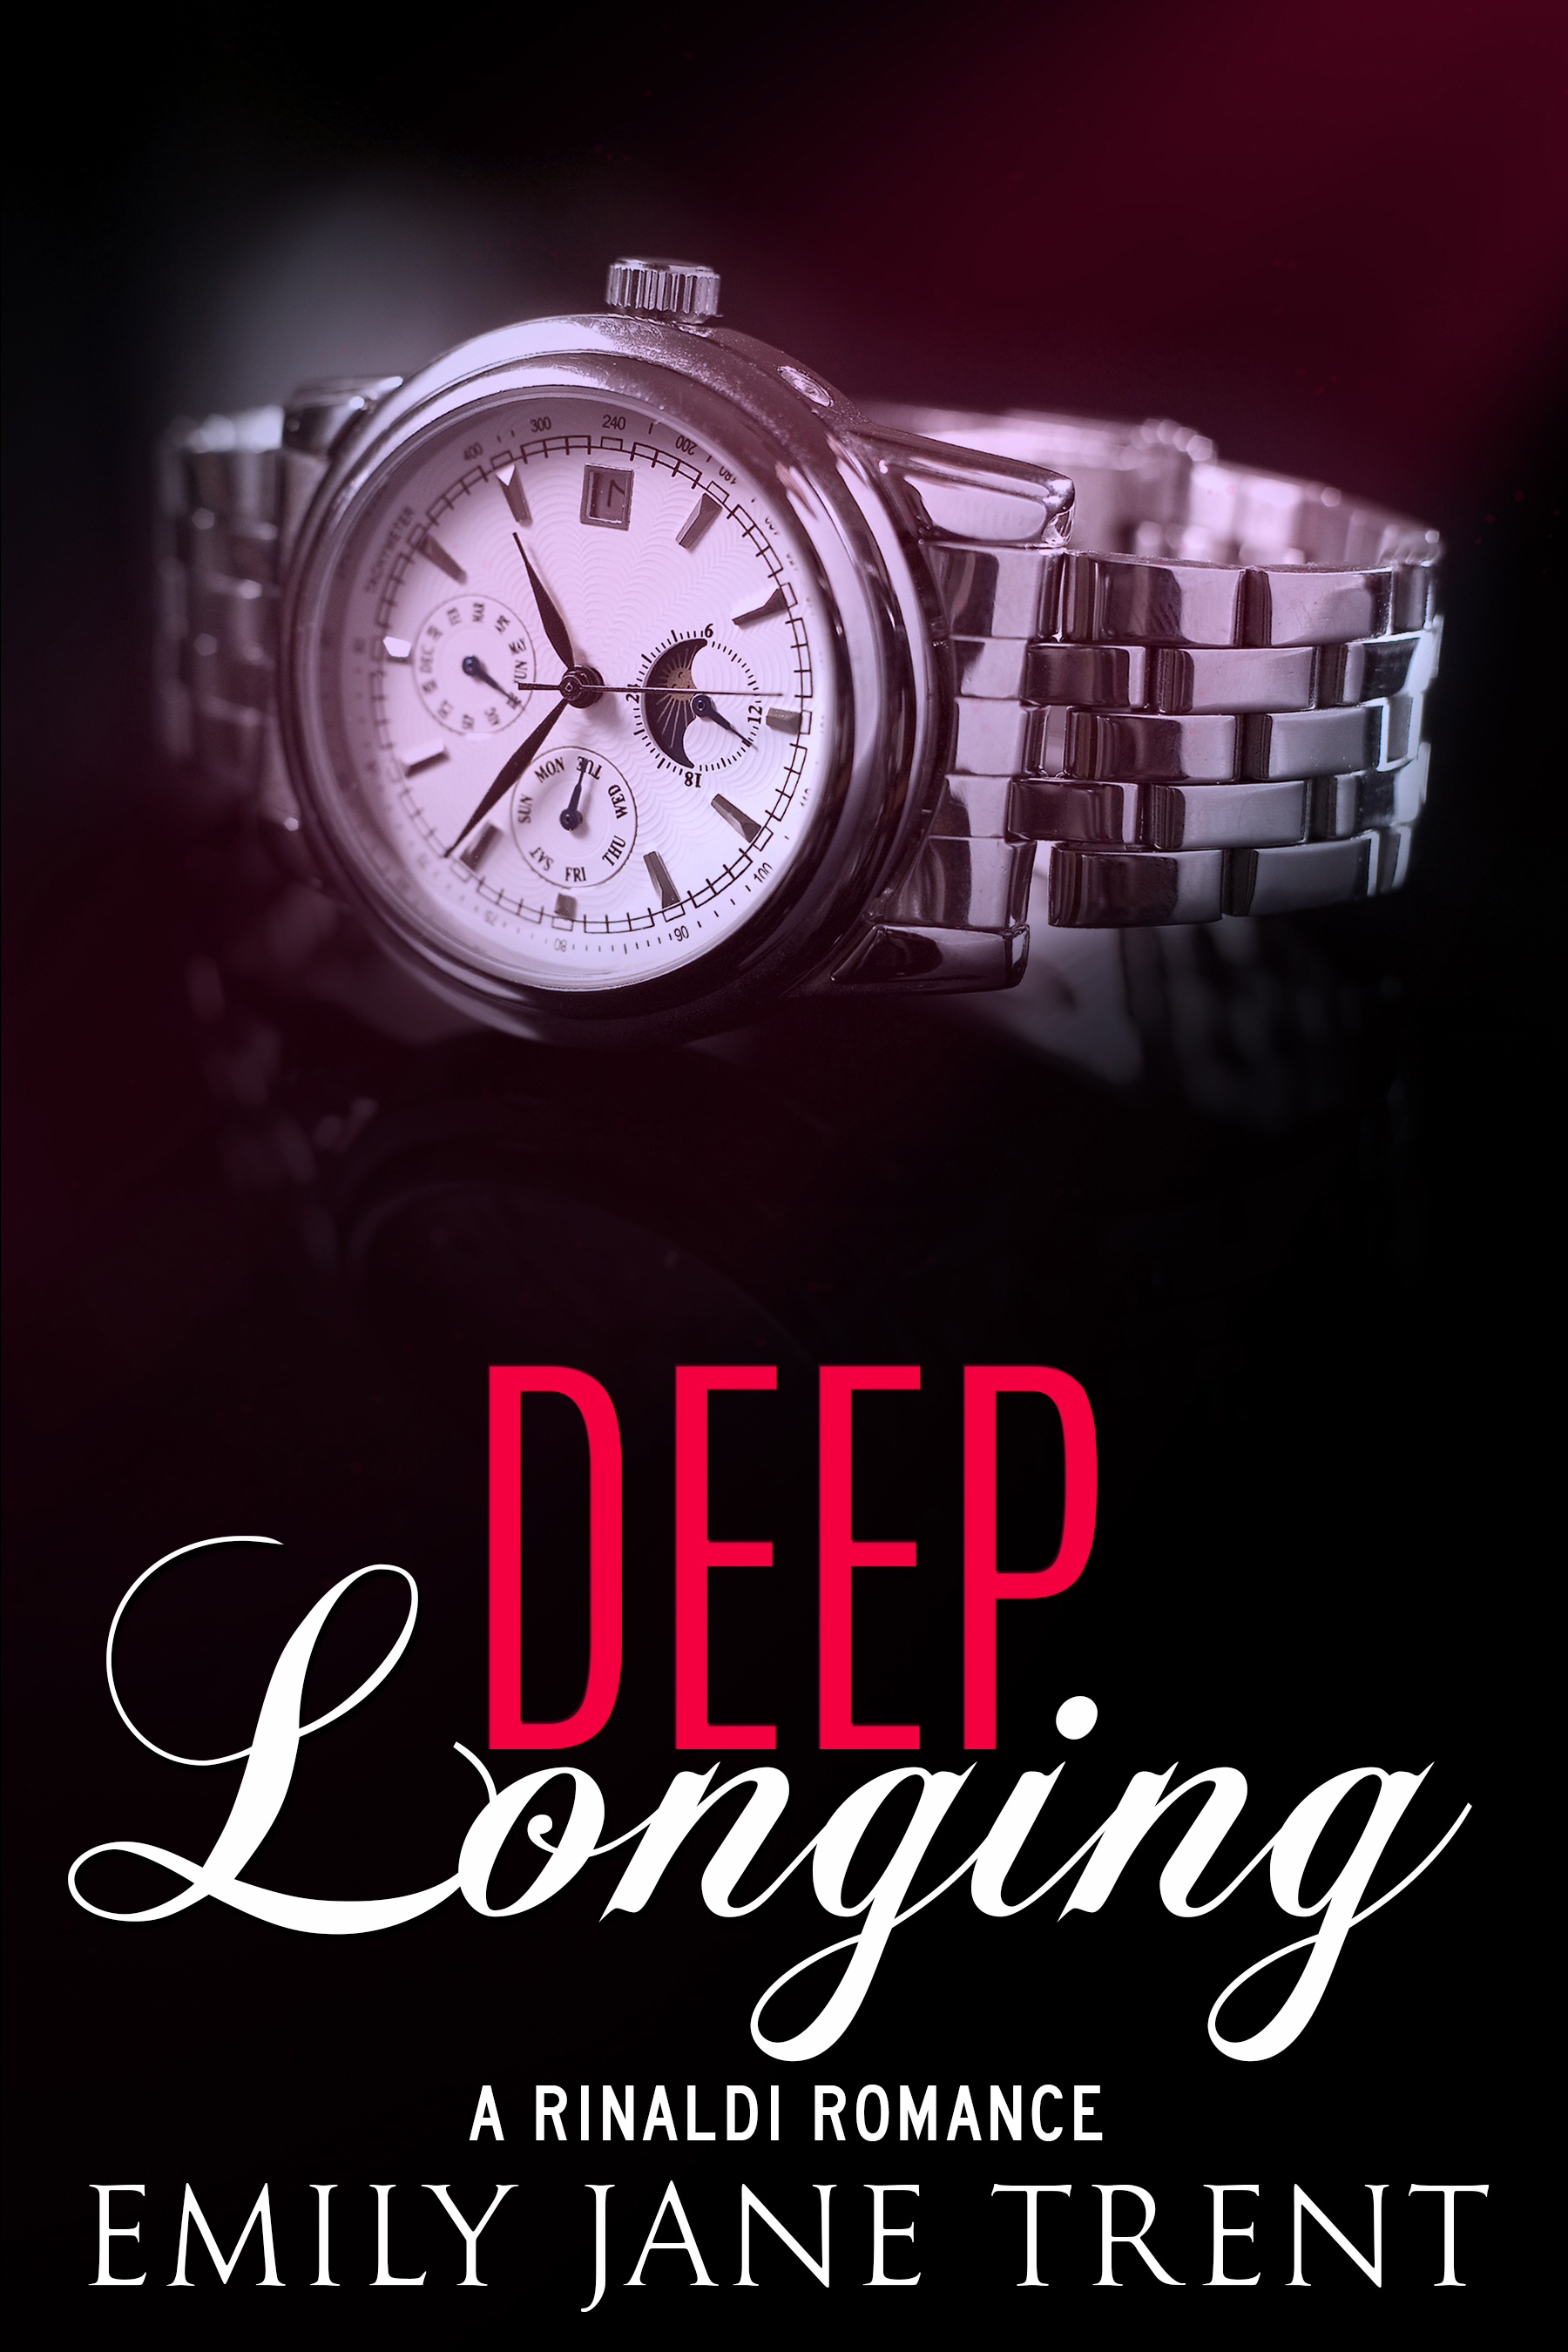 Book 4 - Deep Longing